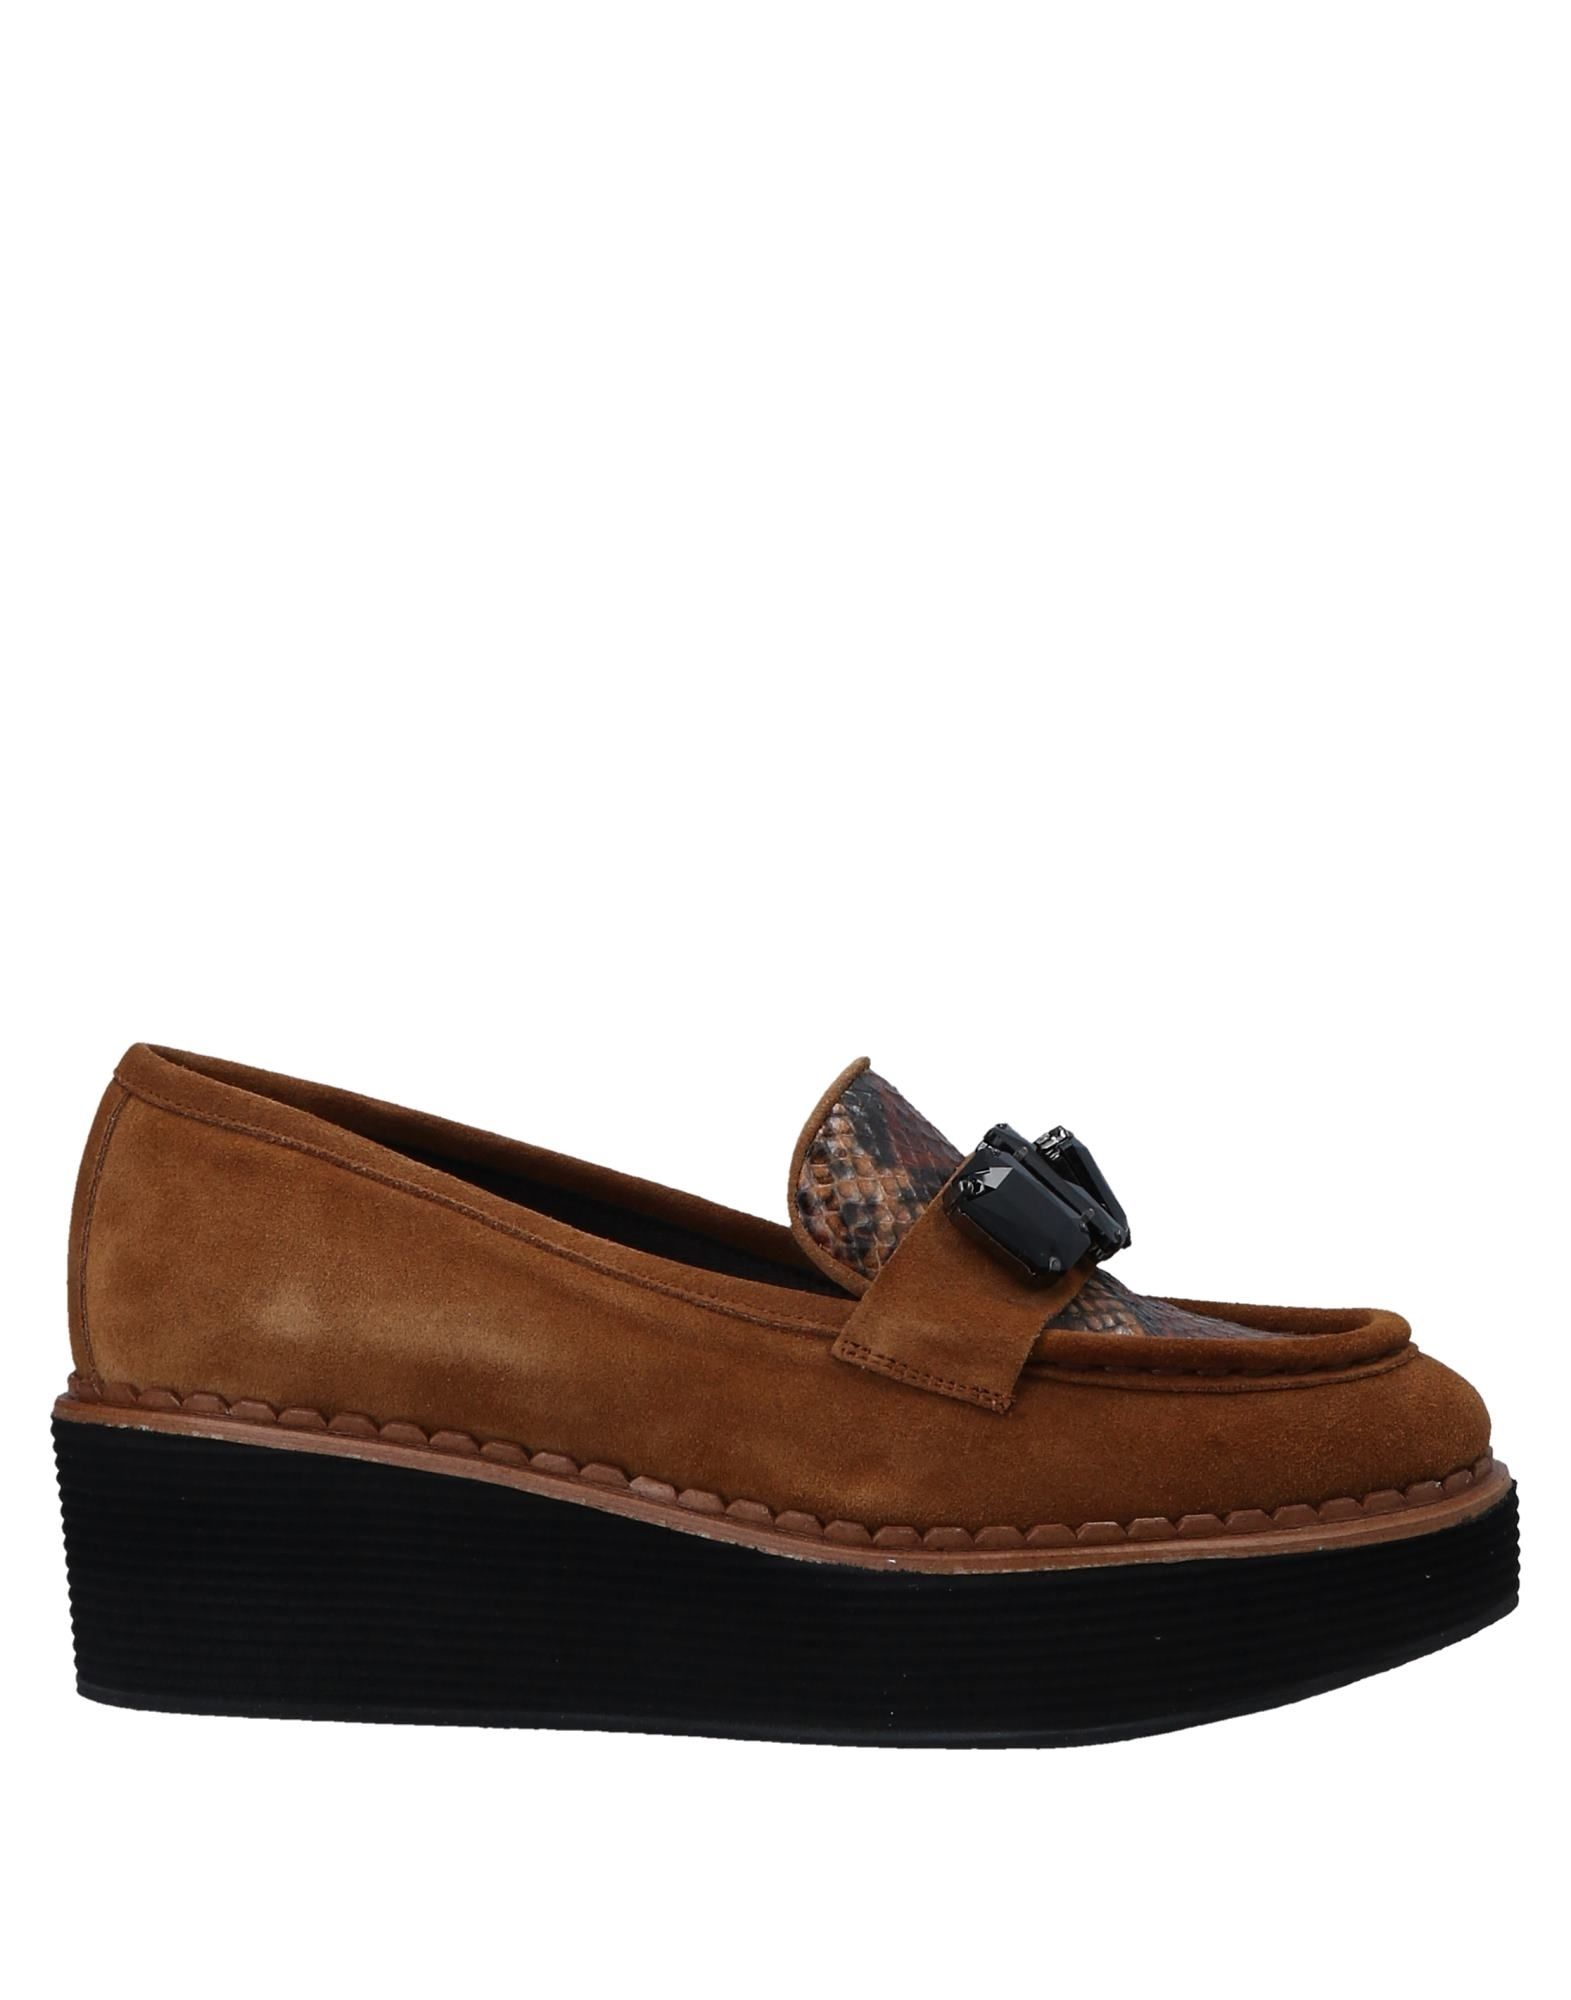 Anaki Mokassins Damen  11552973QN Gute Qualität beliebte Schuhe